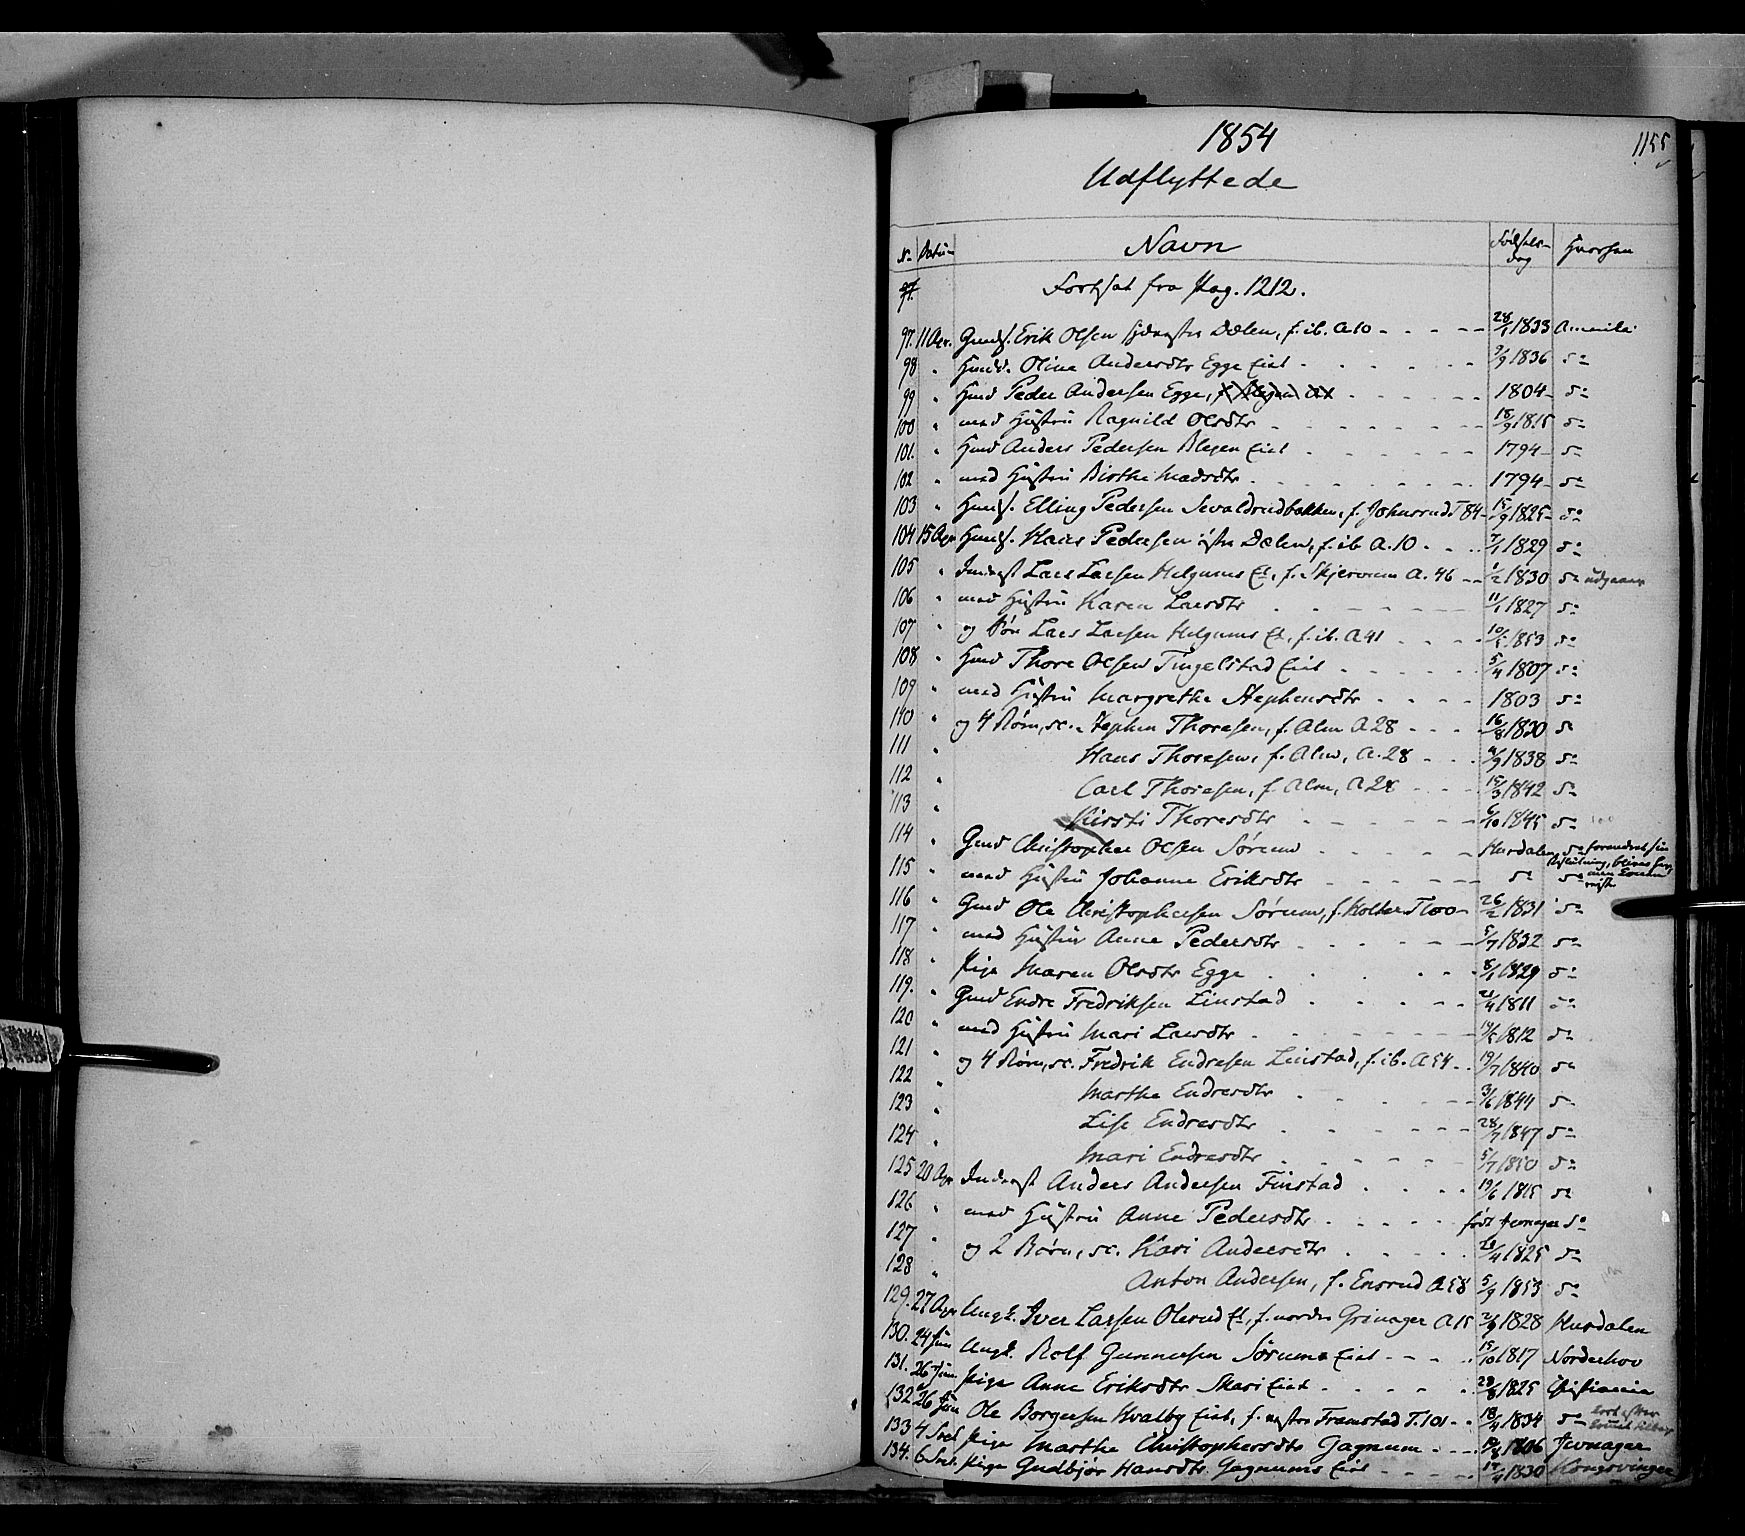 SAH, Gran prestekontor, Ministerialbok nr. 11, 1842-1856, s. 1154-1155